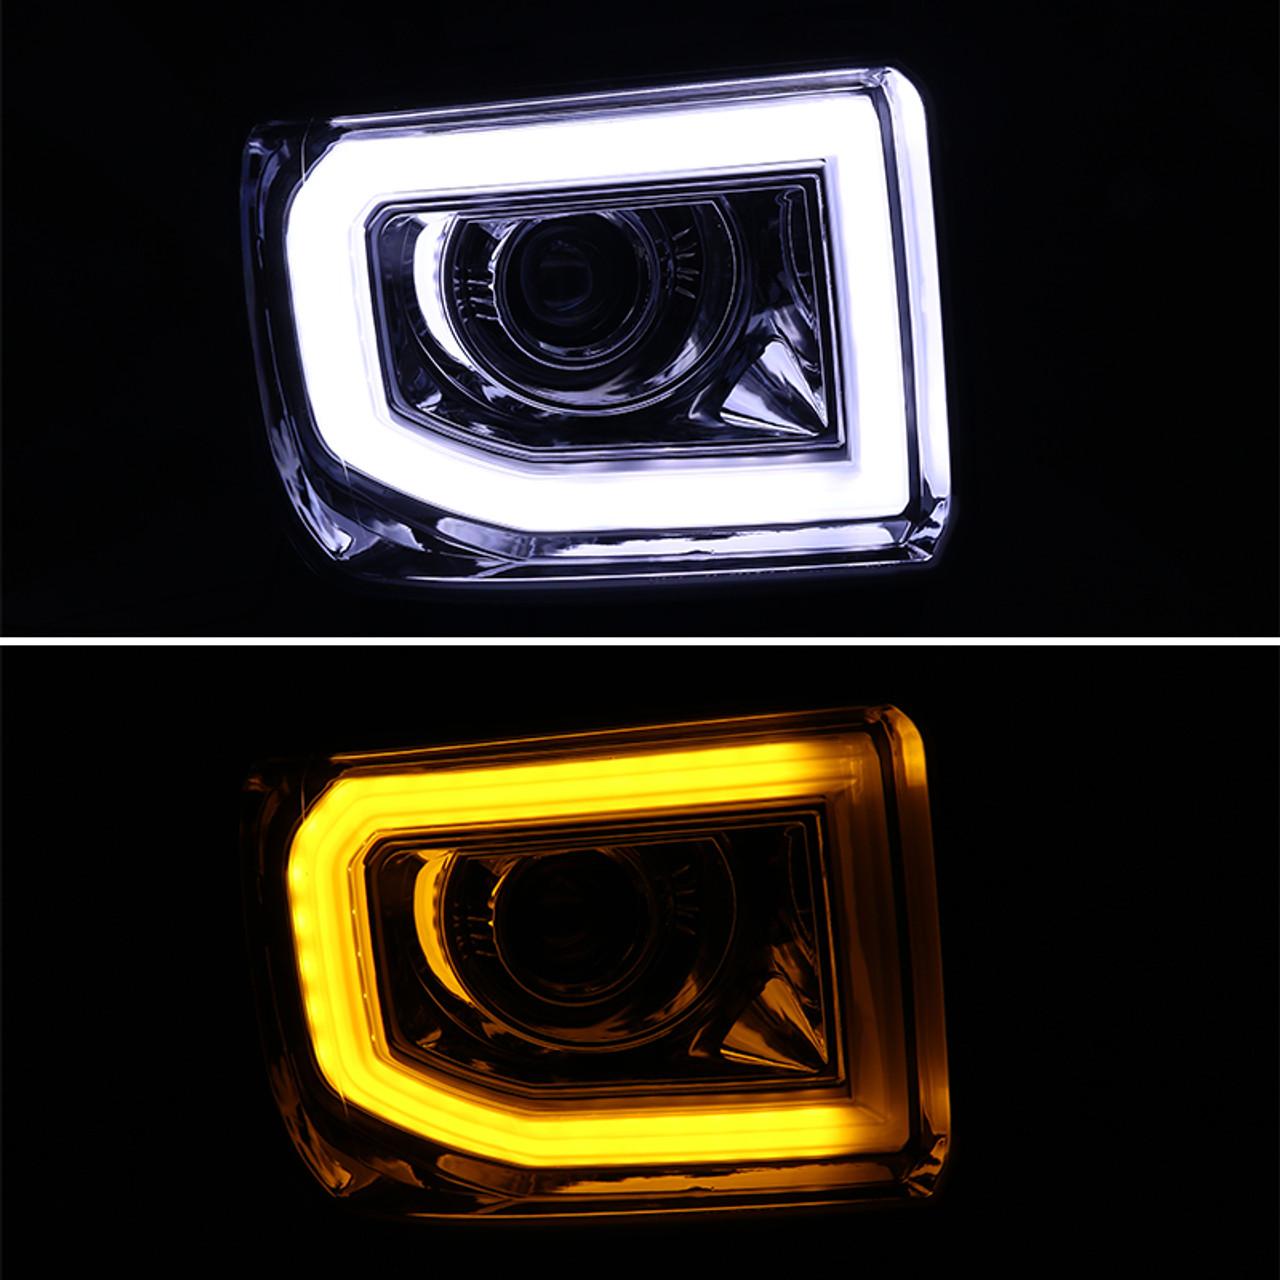 2014 2019 Gmc Sierra 1500 2500hd 3500hd Led Drl Projector Headlight W Led Turn Signal Matte Black Housing Clear Lens Spec D Tuning